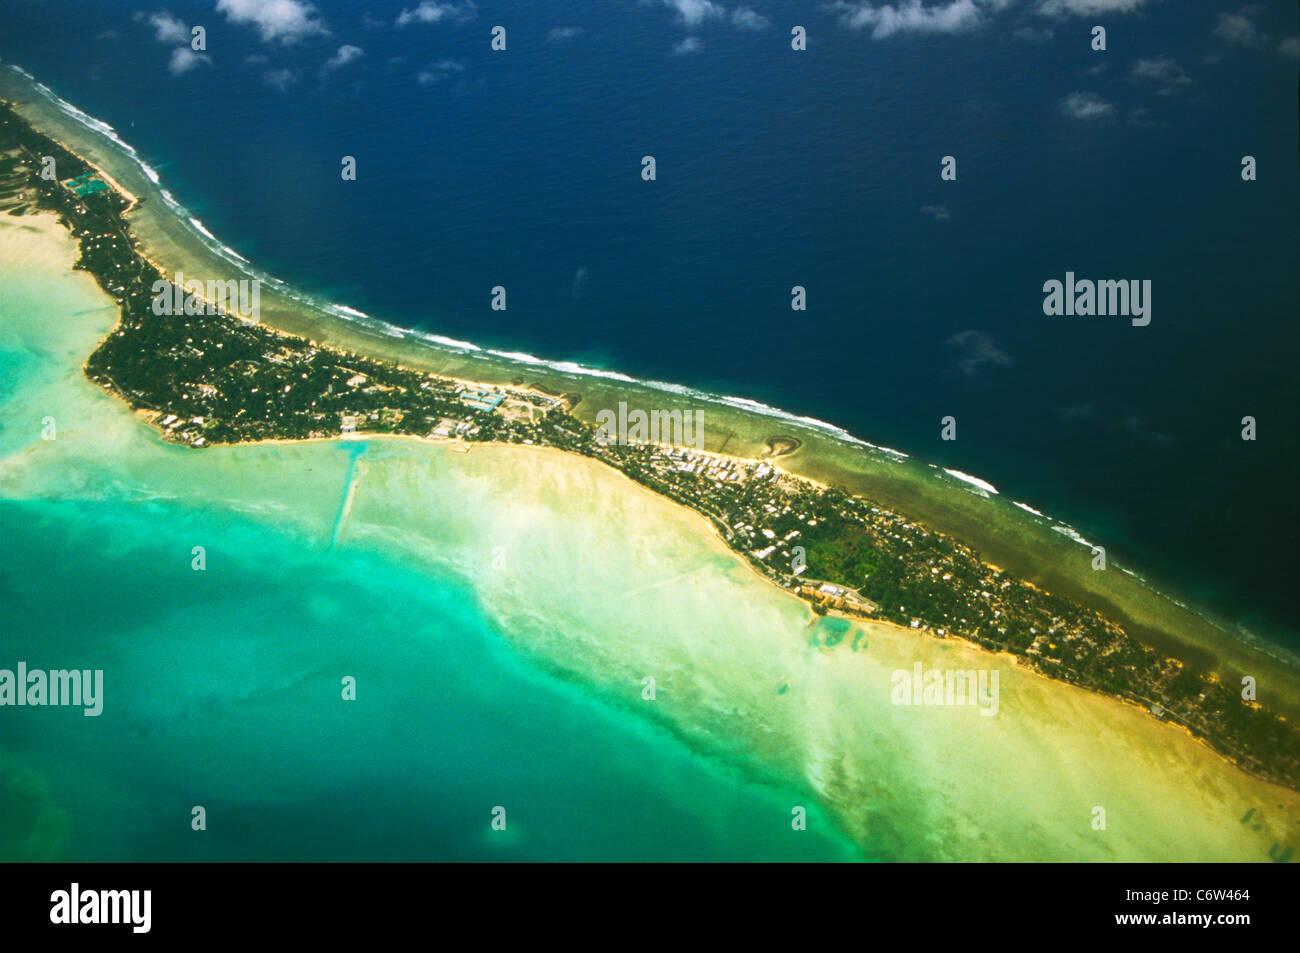 Aerial view of Tarawa Atoll, Republic of Kiribati, central Pacific - Stock Image